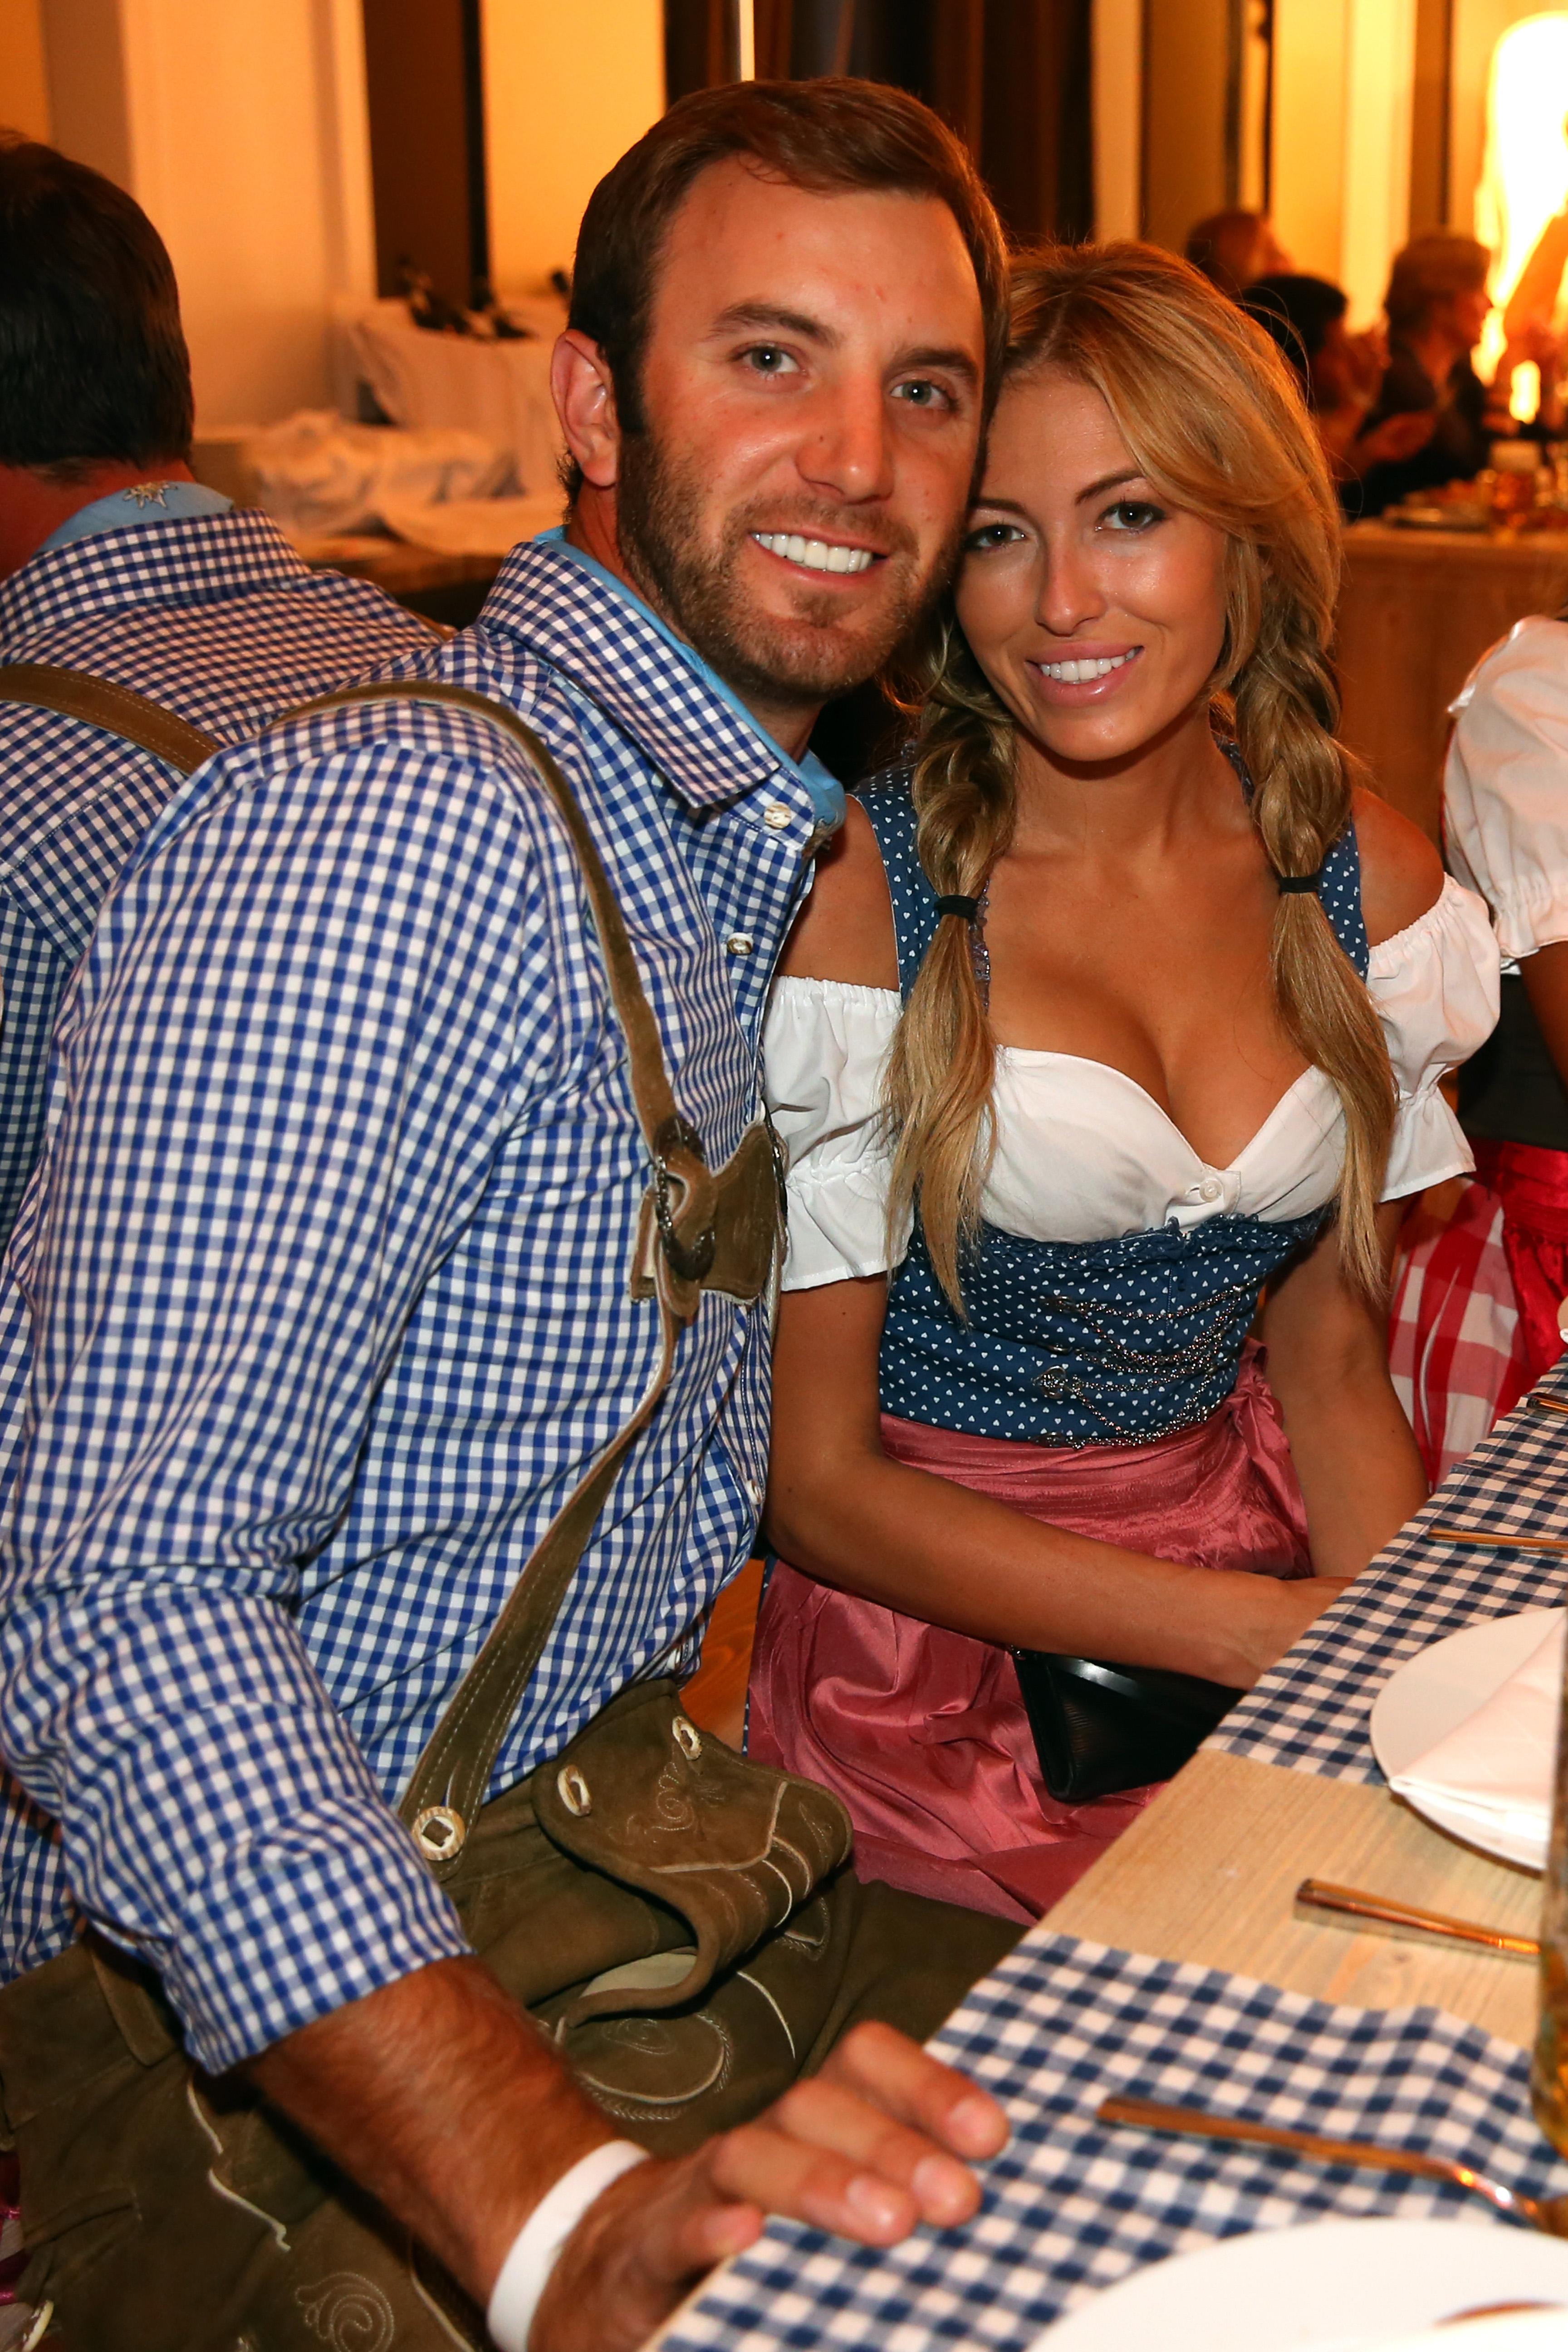 Paulina Gretzky Engaged To Golfer Dustin Johnson Access Online